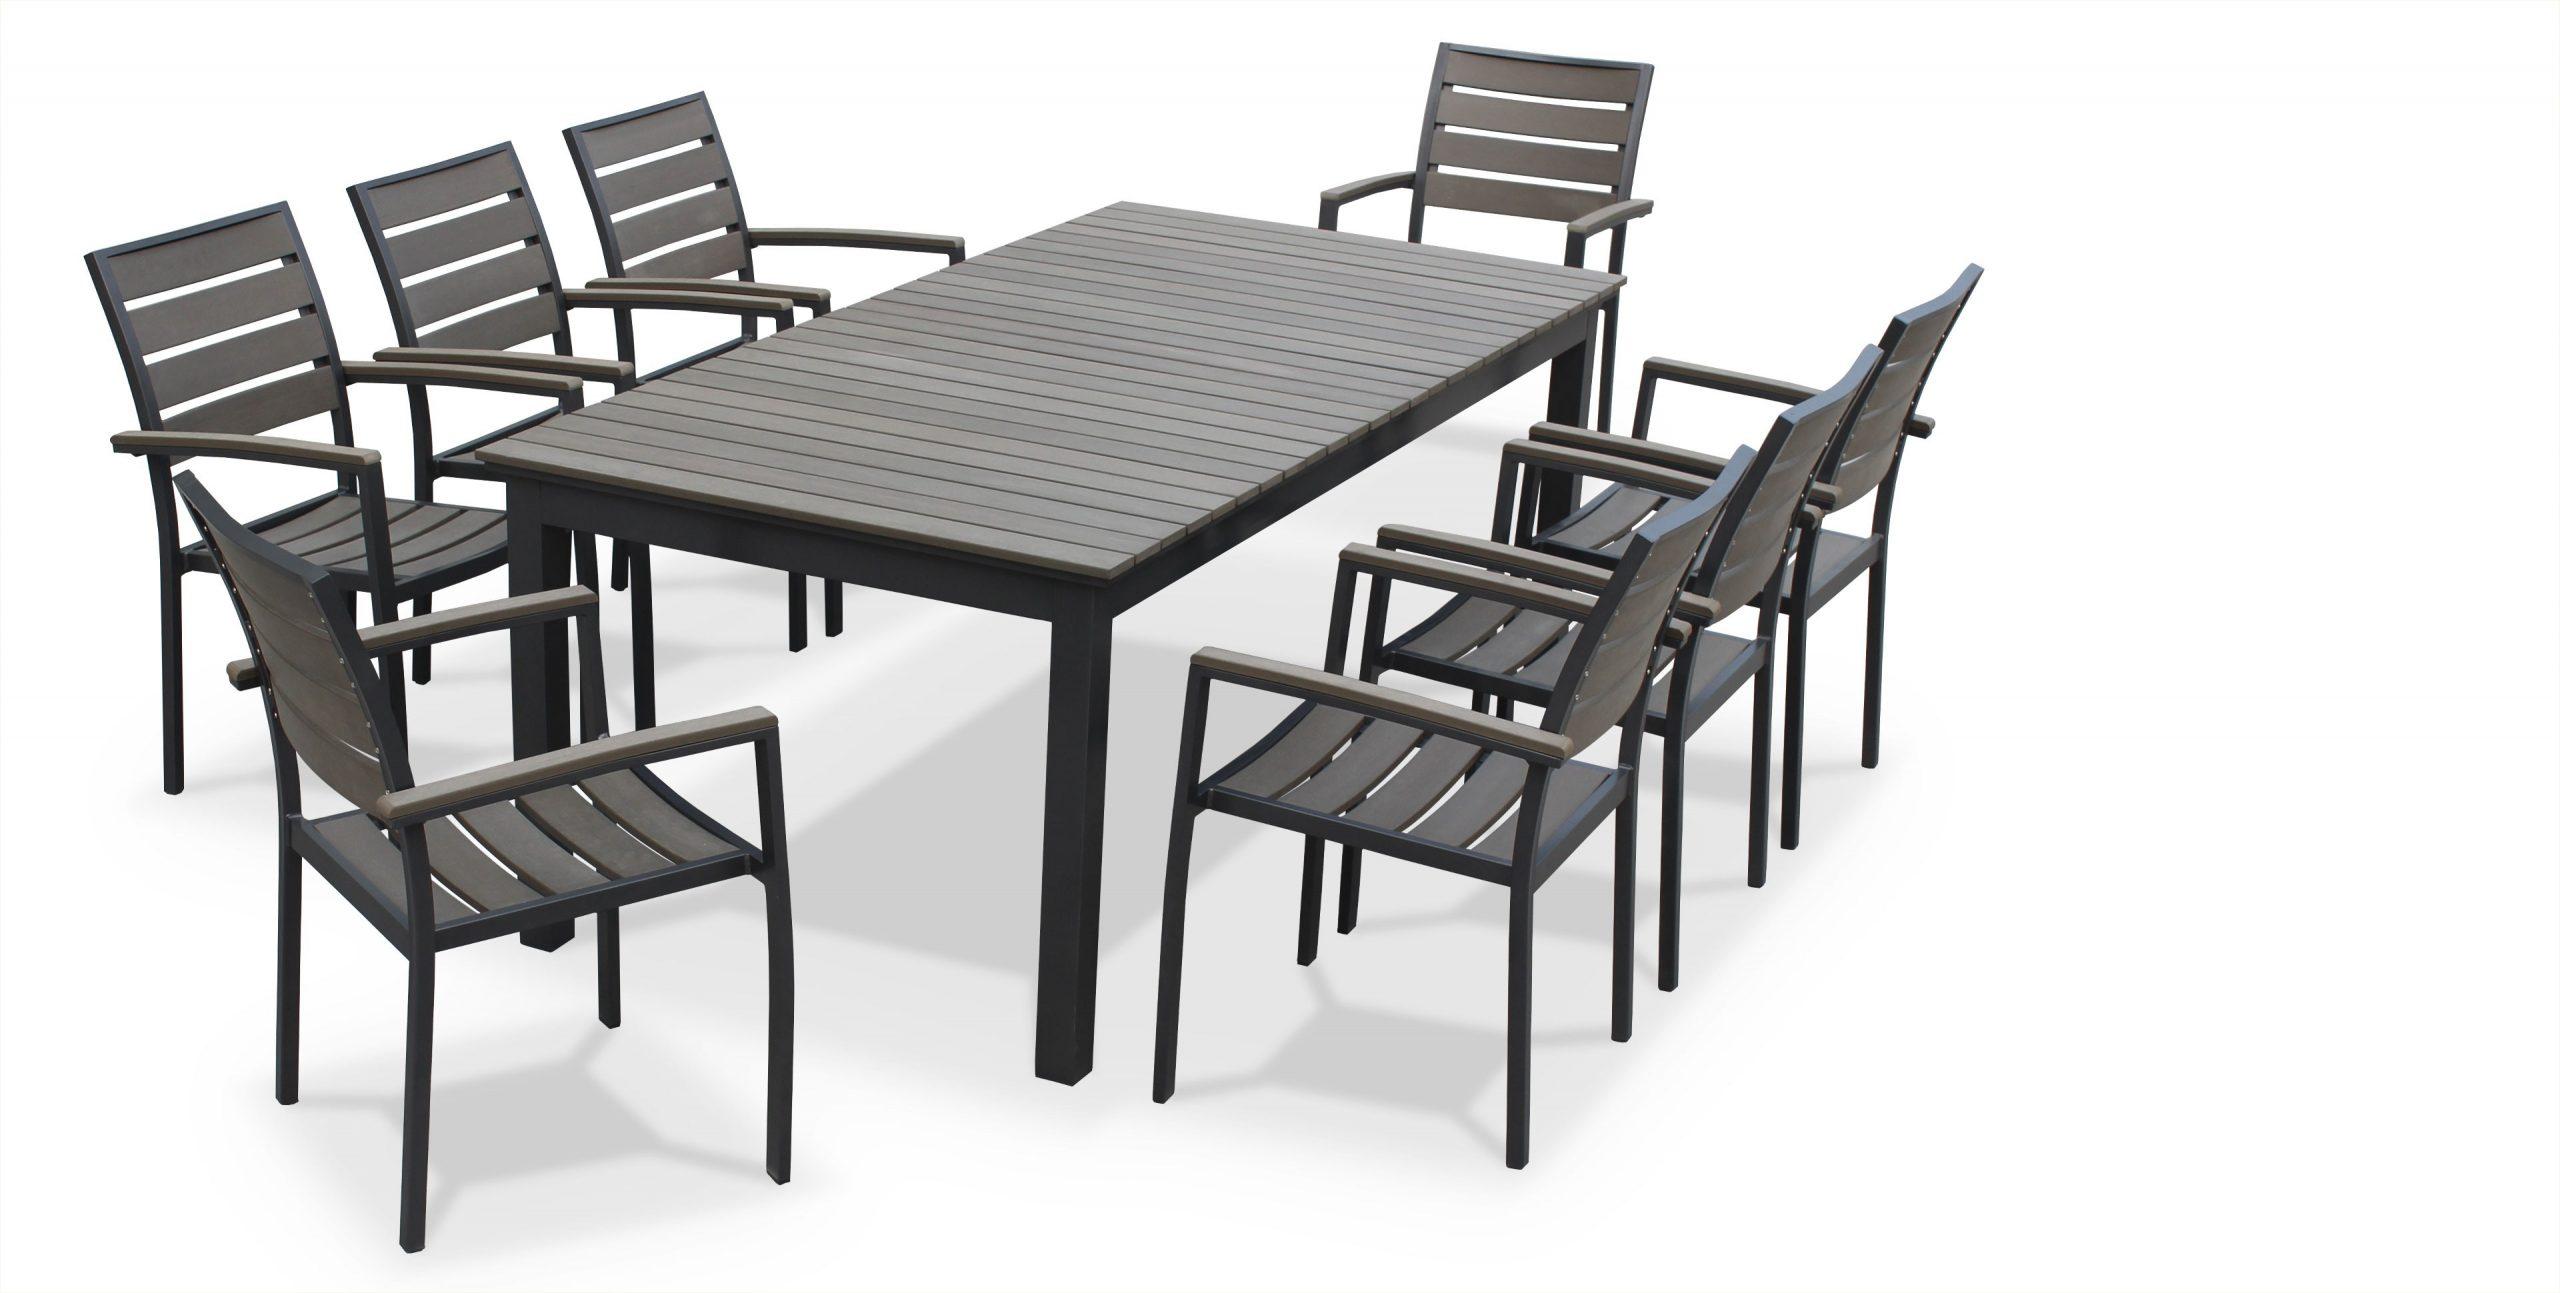 De Jardiland Table Extensible Table Table De Jardin ... dedans Jardiland Mobilier De Jardin